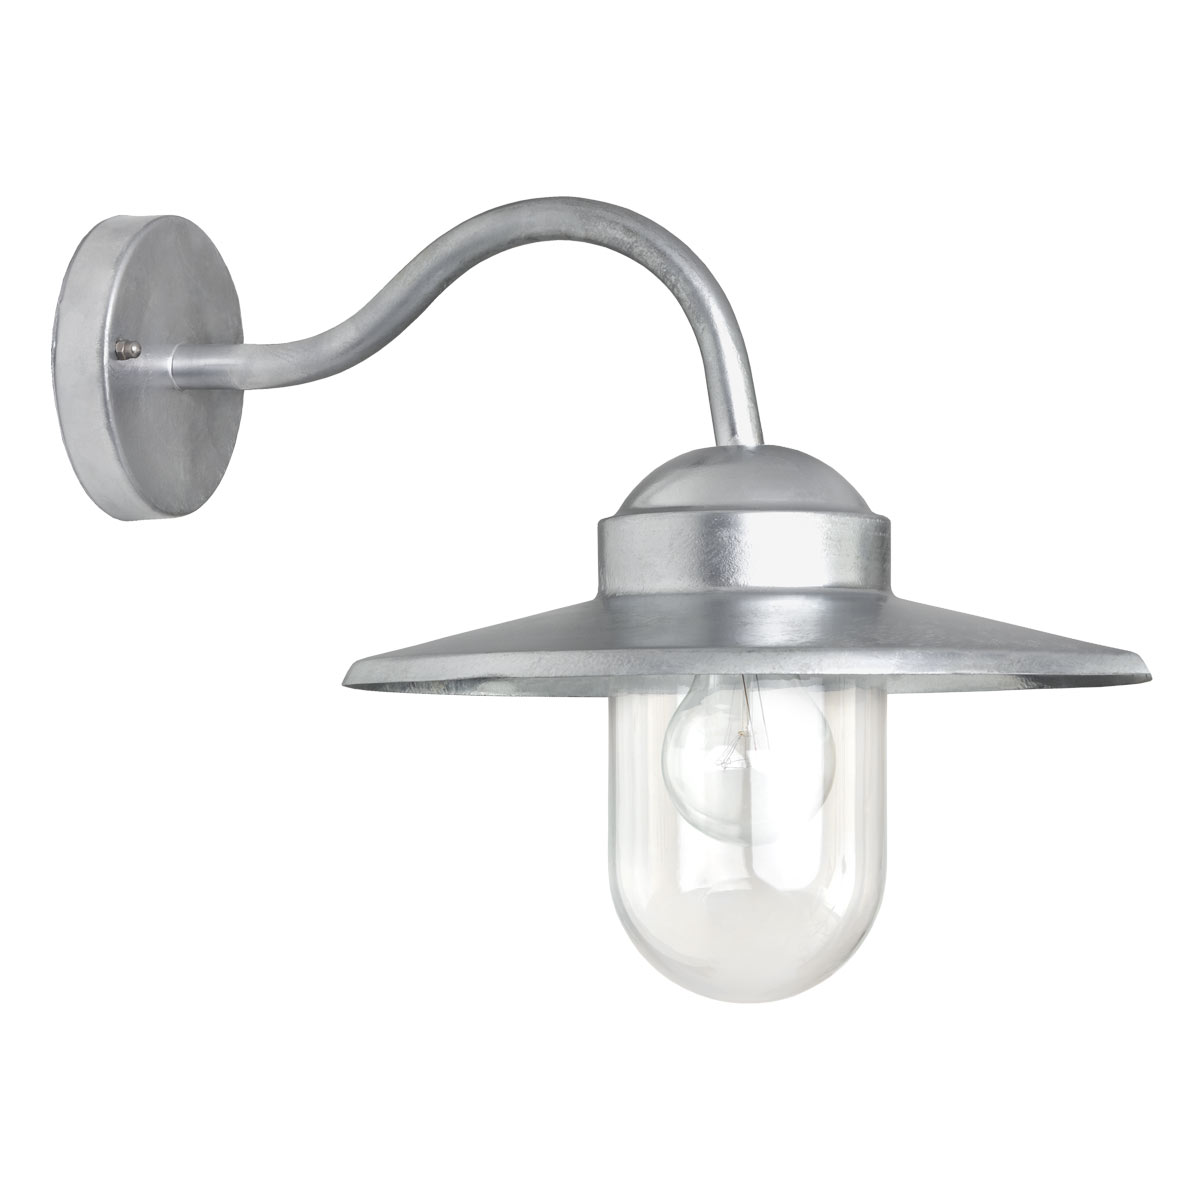 Buitenlamp Dolce verzinkt